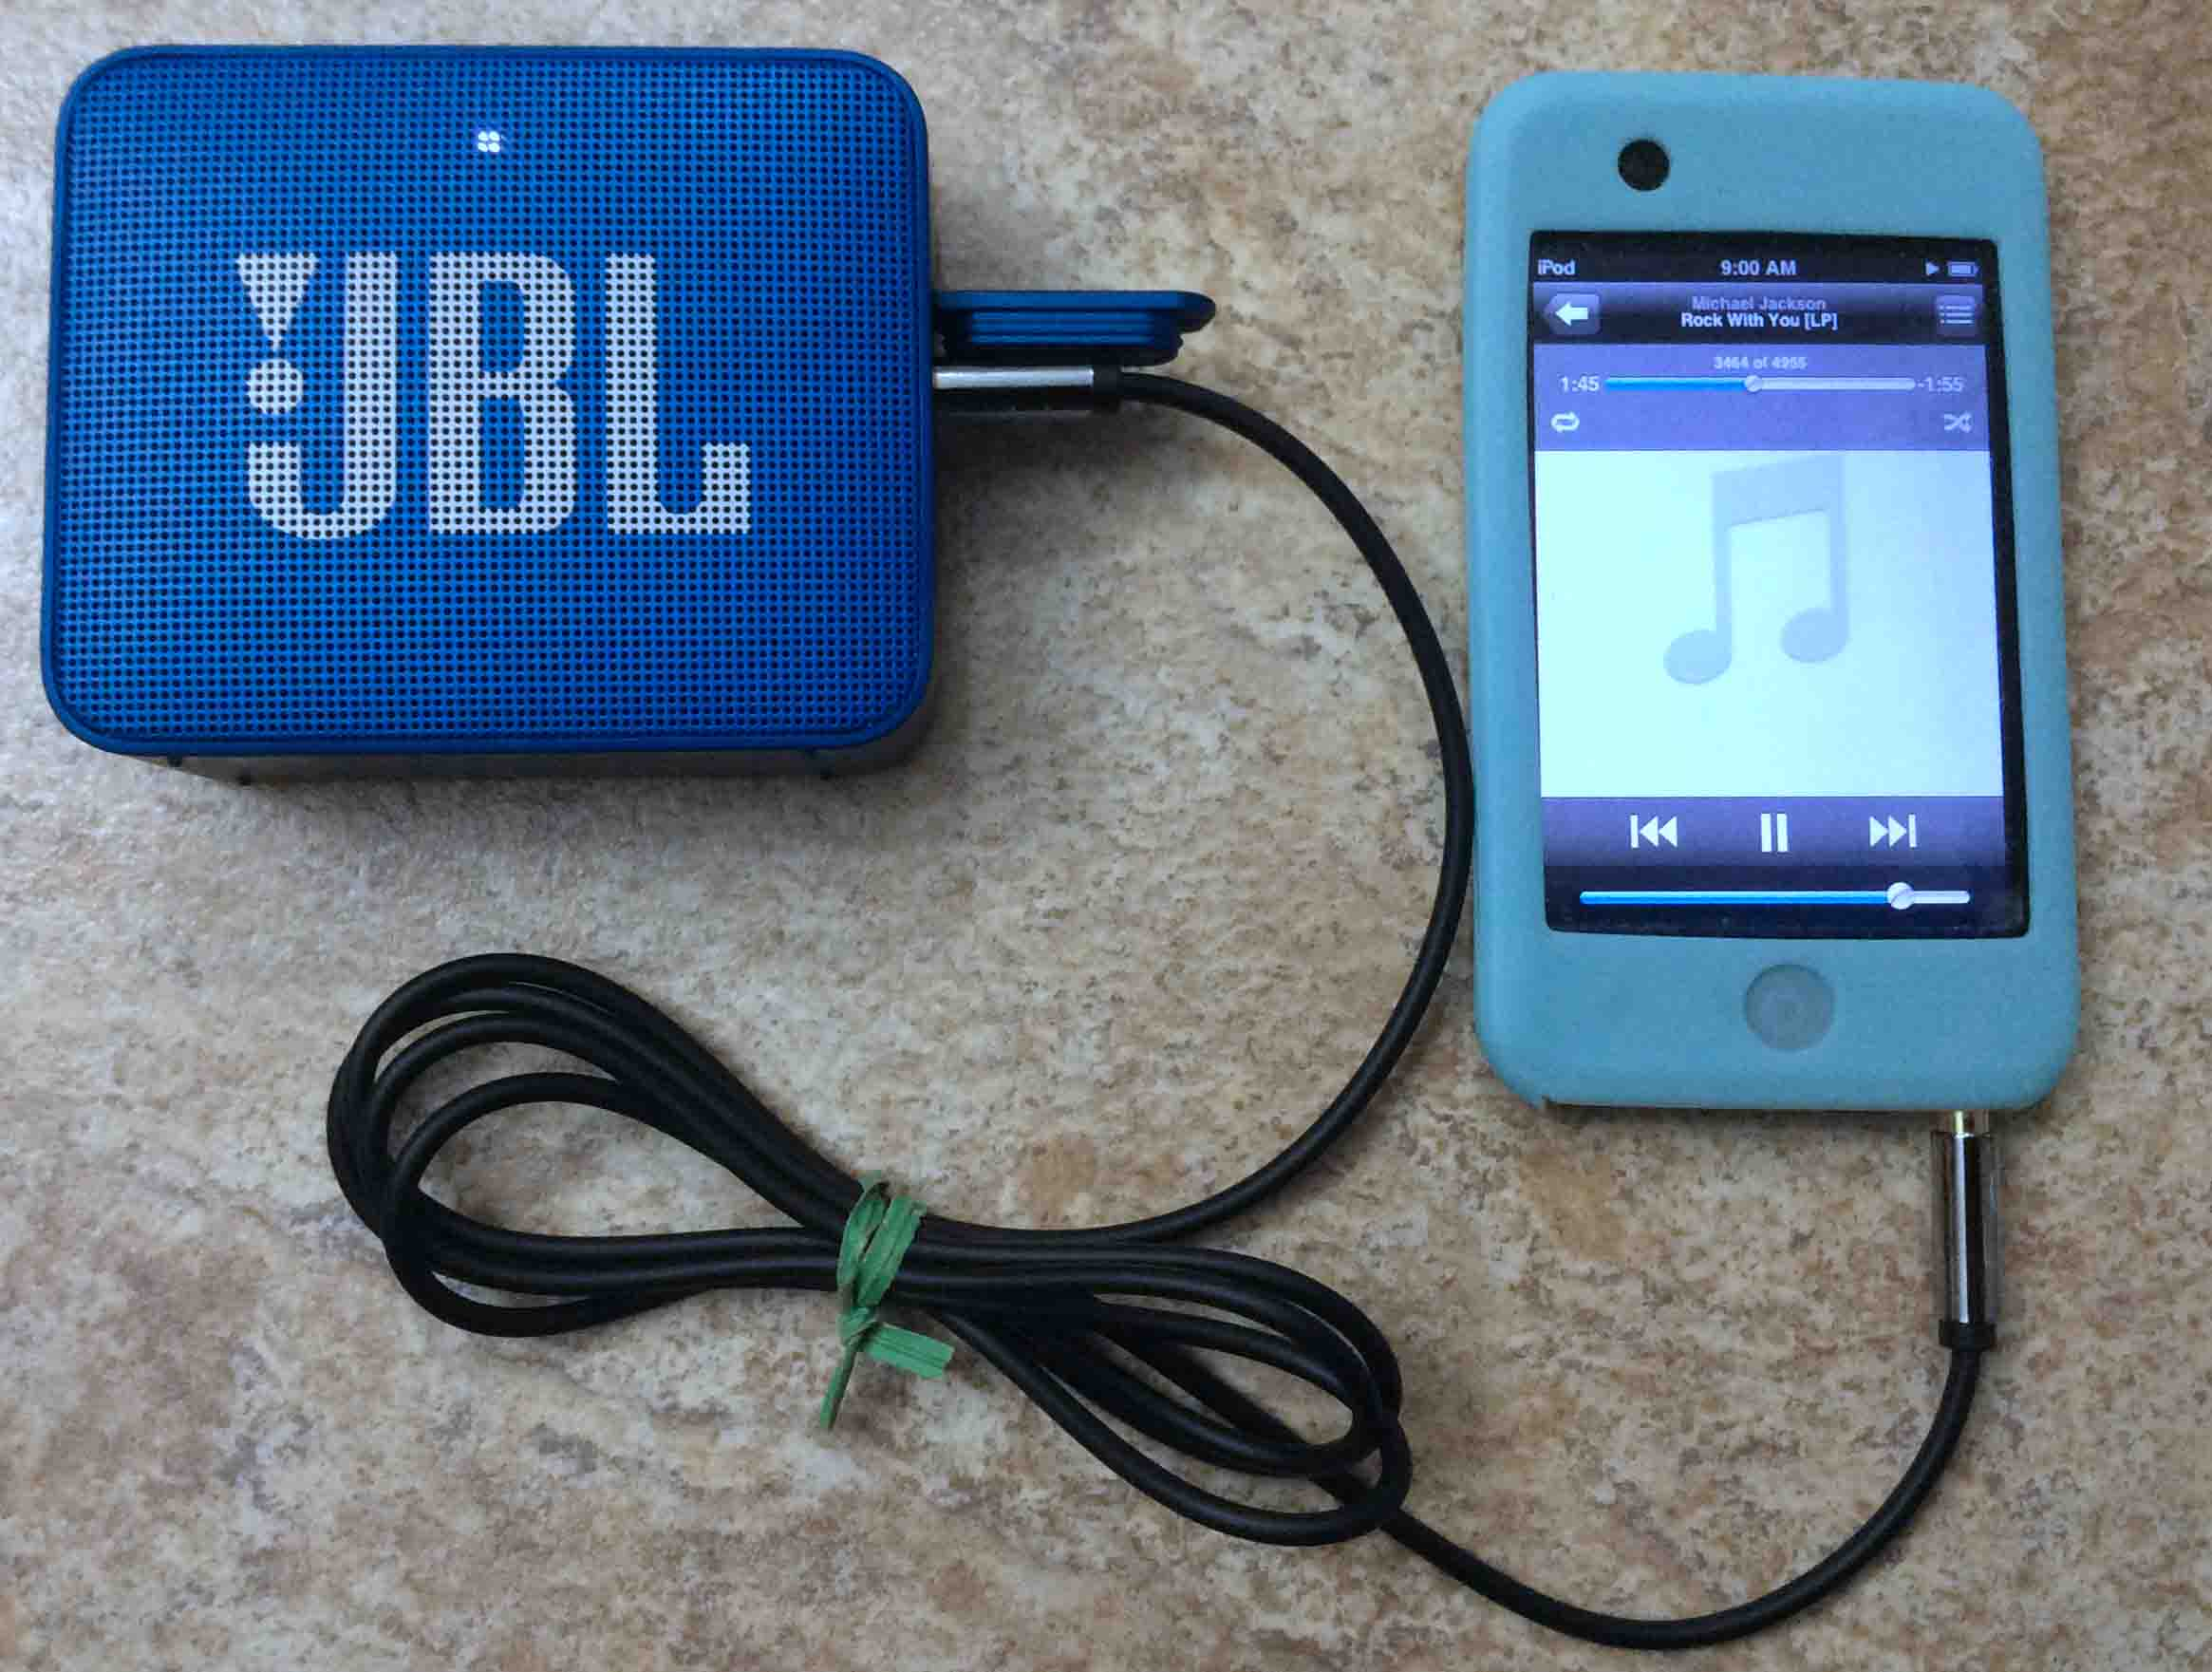 Jbl Go 2 Review Of This Portable Bluetooth Mini Speaker Tom S Tek Stop